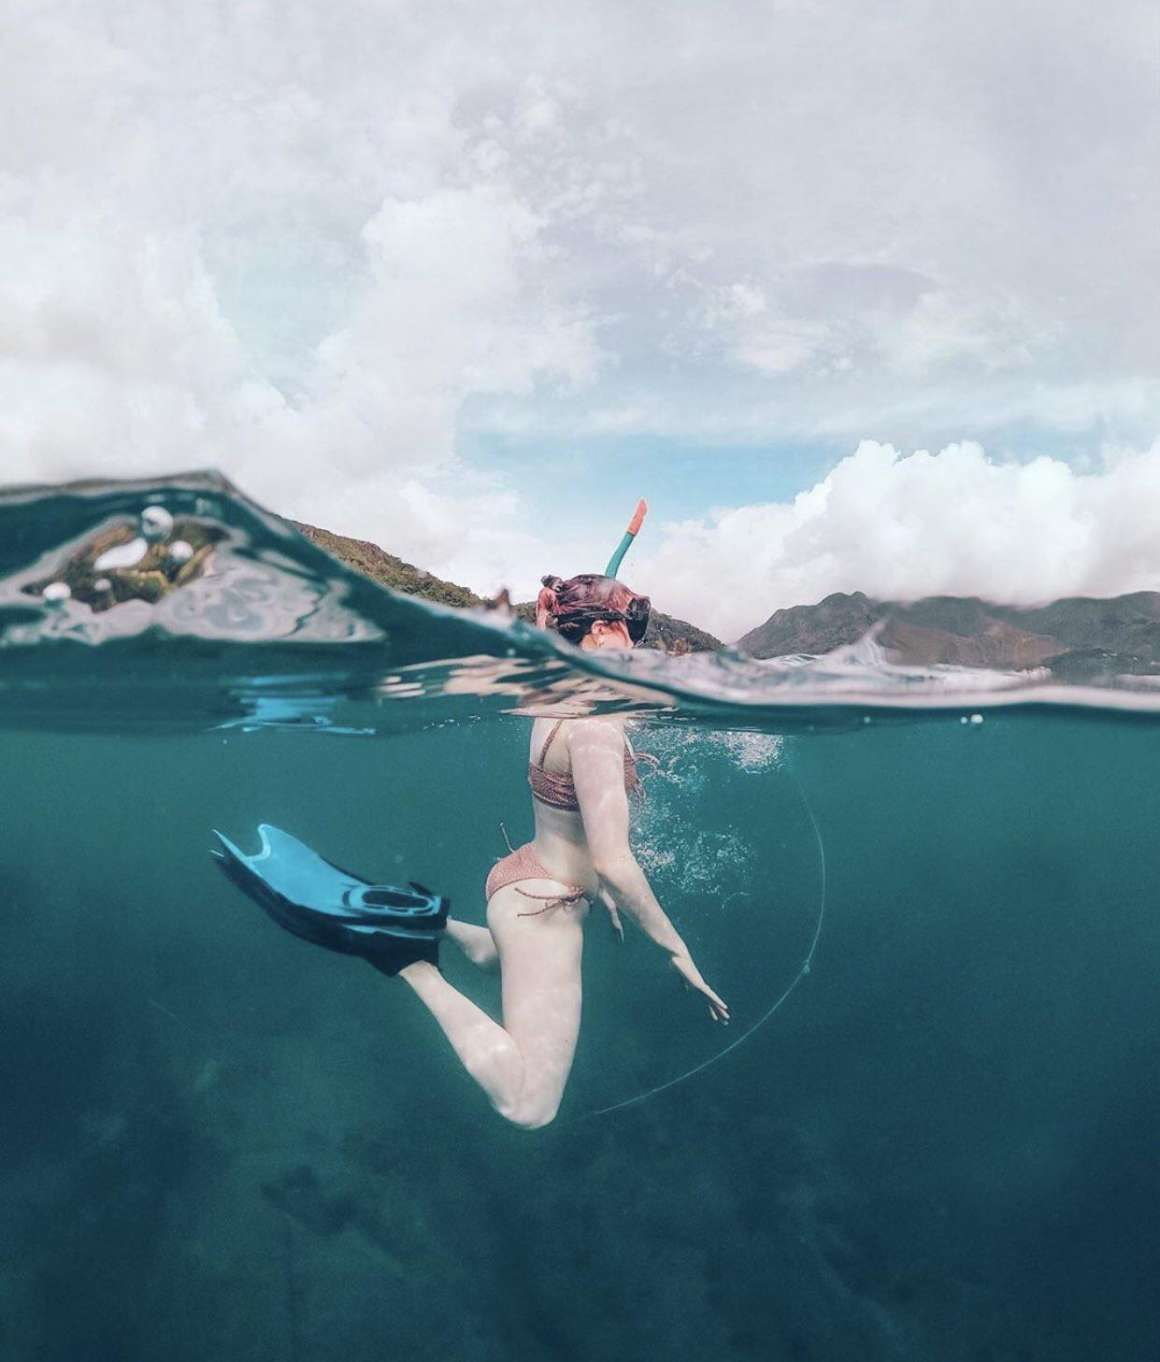 Maisie Williams in a Bikini in Seychelles - Instagram